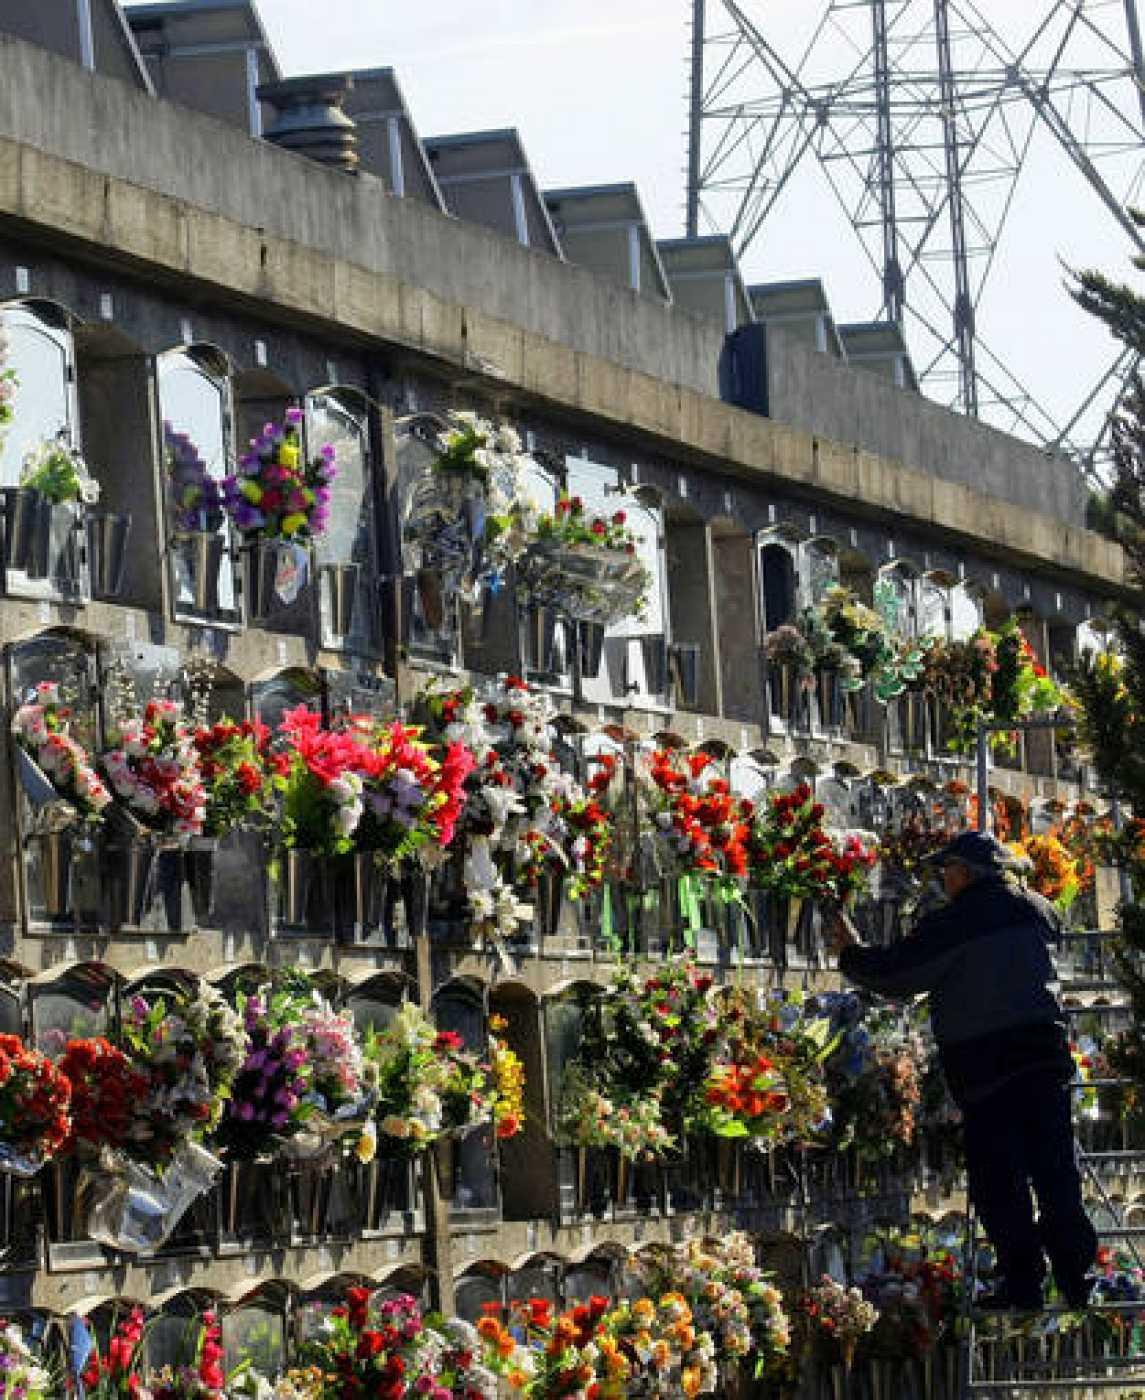 A man arranges flowers in a cemetery with solar panels in Santa Caloma de Gramenet near Barcelona